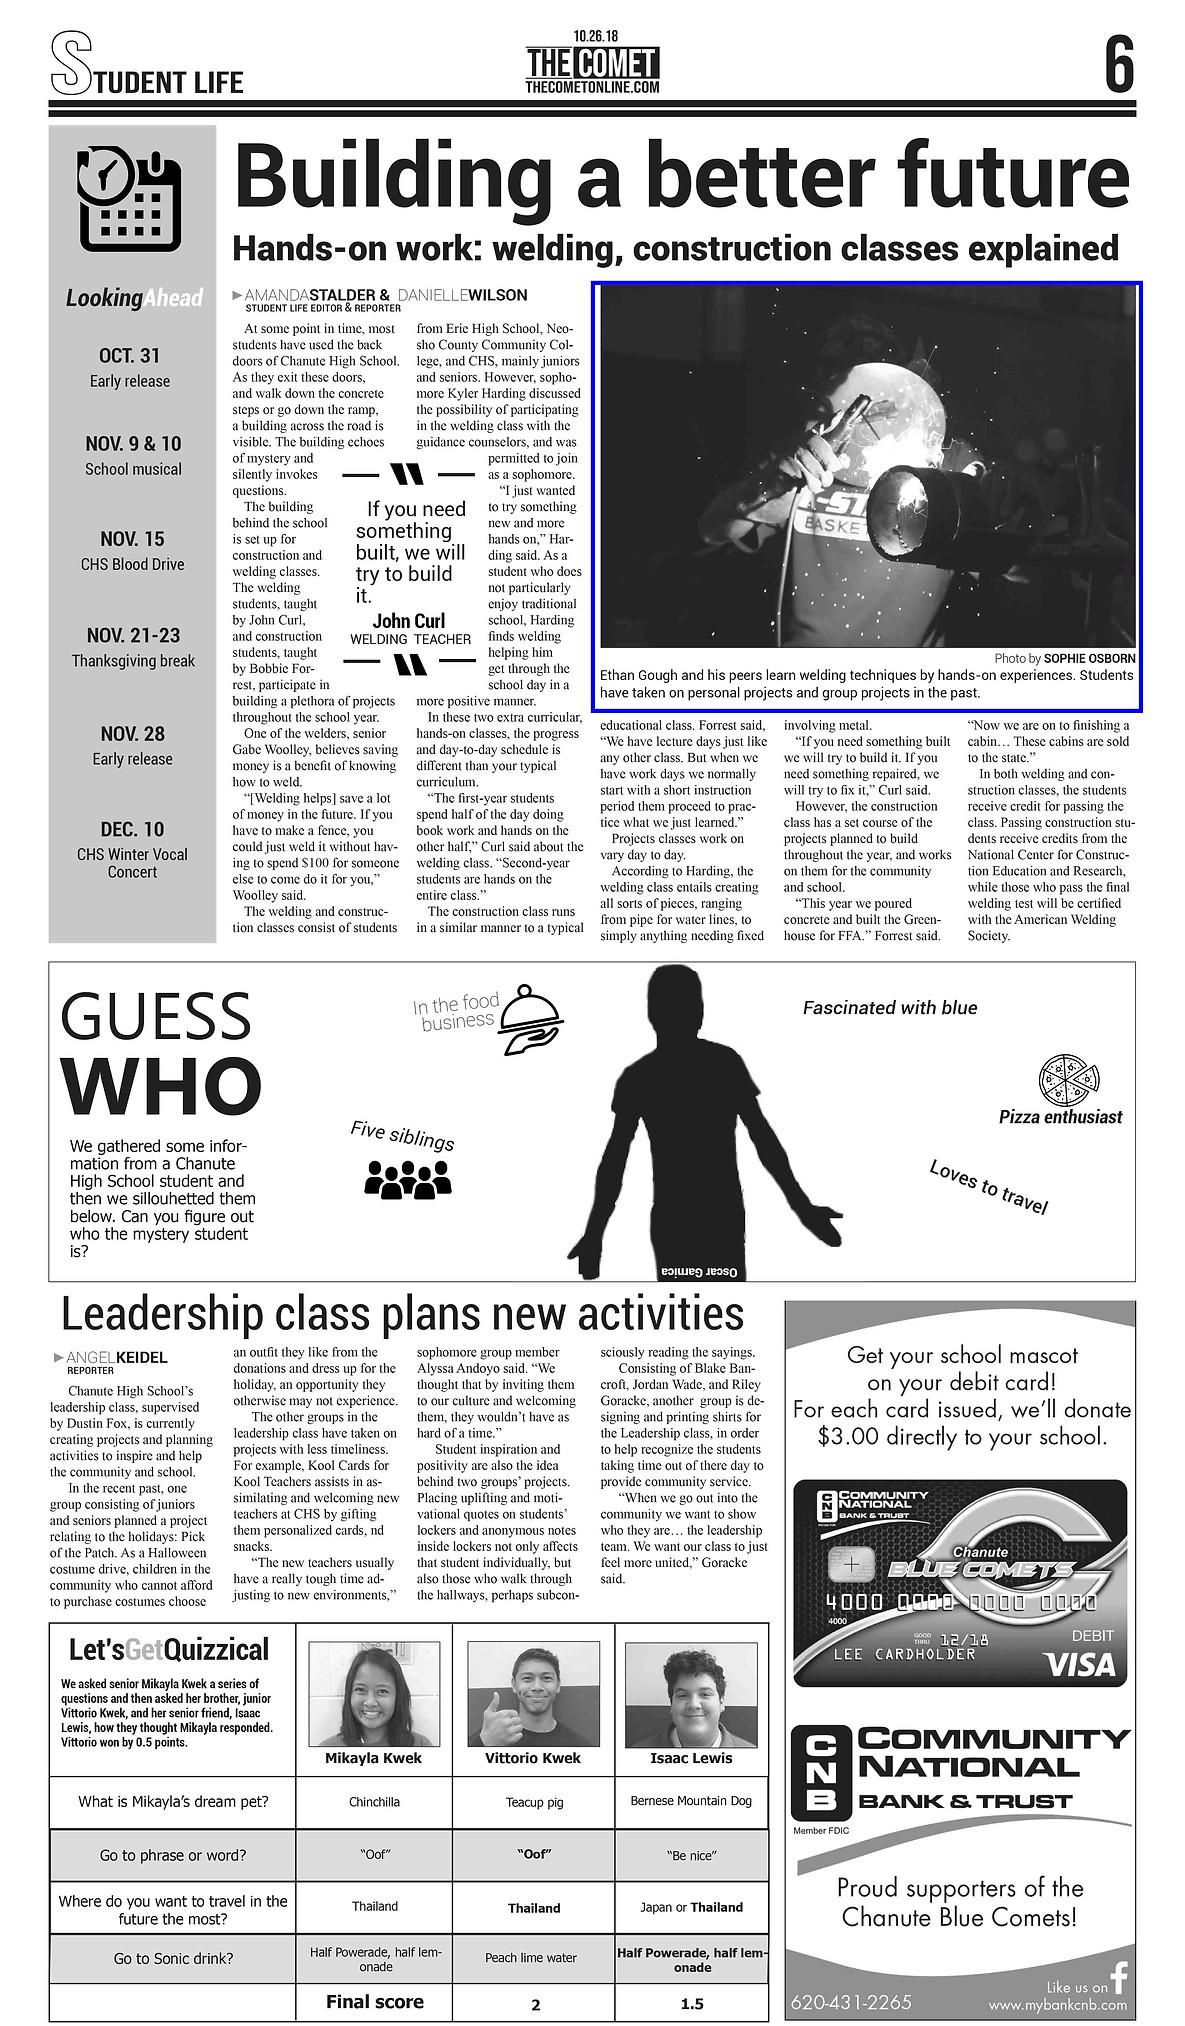 10-26-2018 Page 6-JPEG.jpg